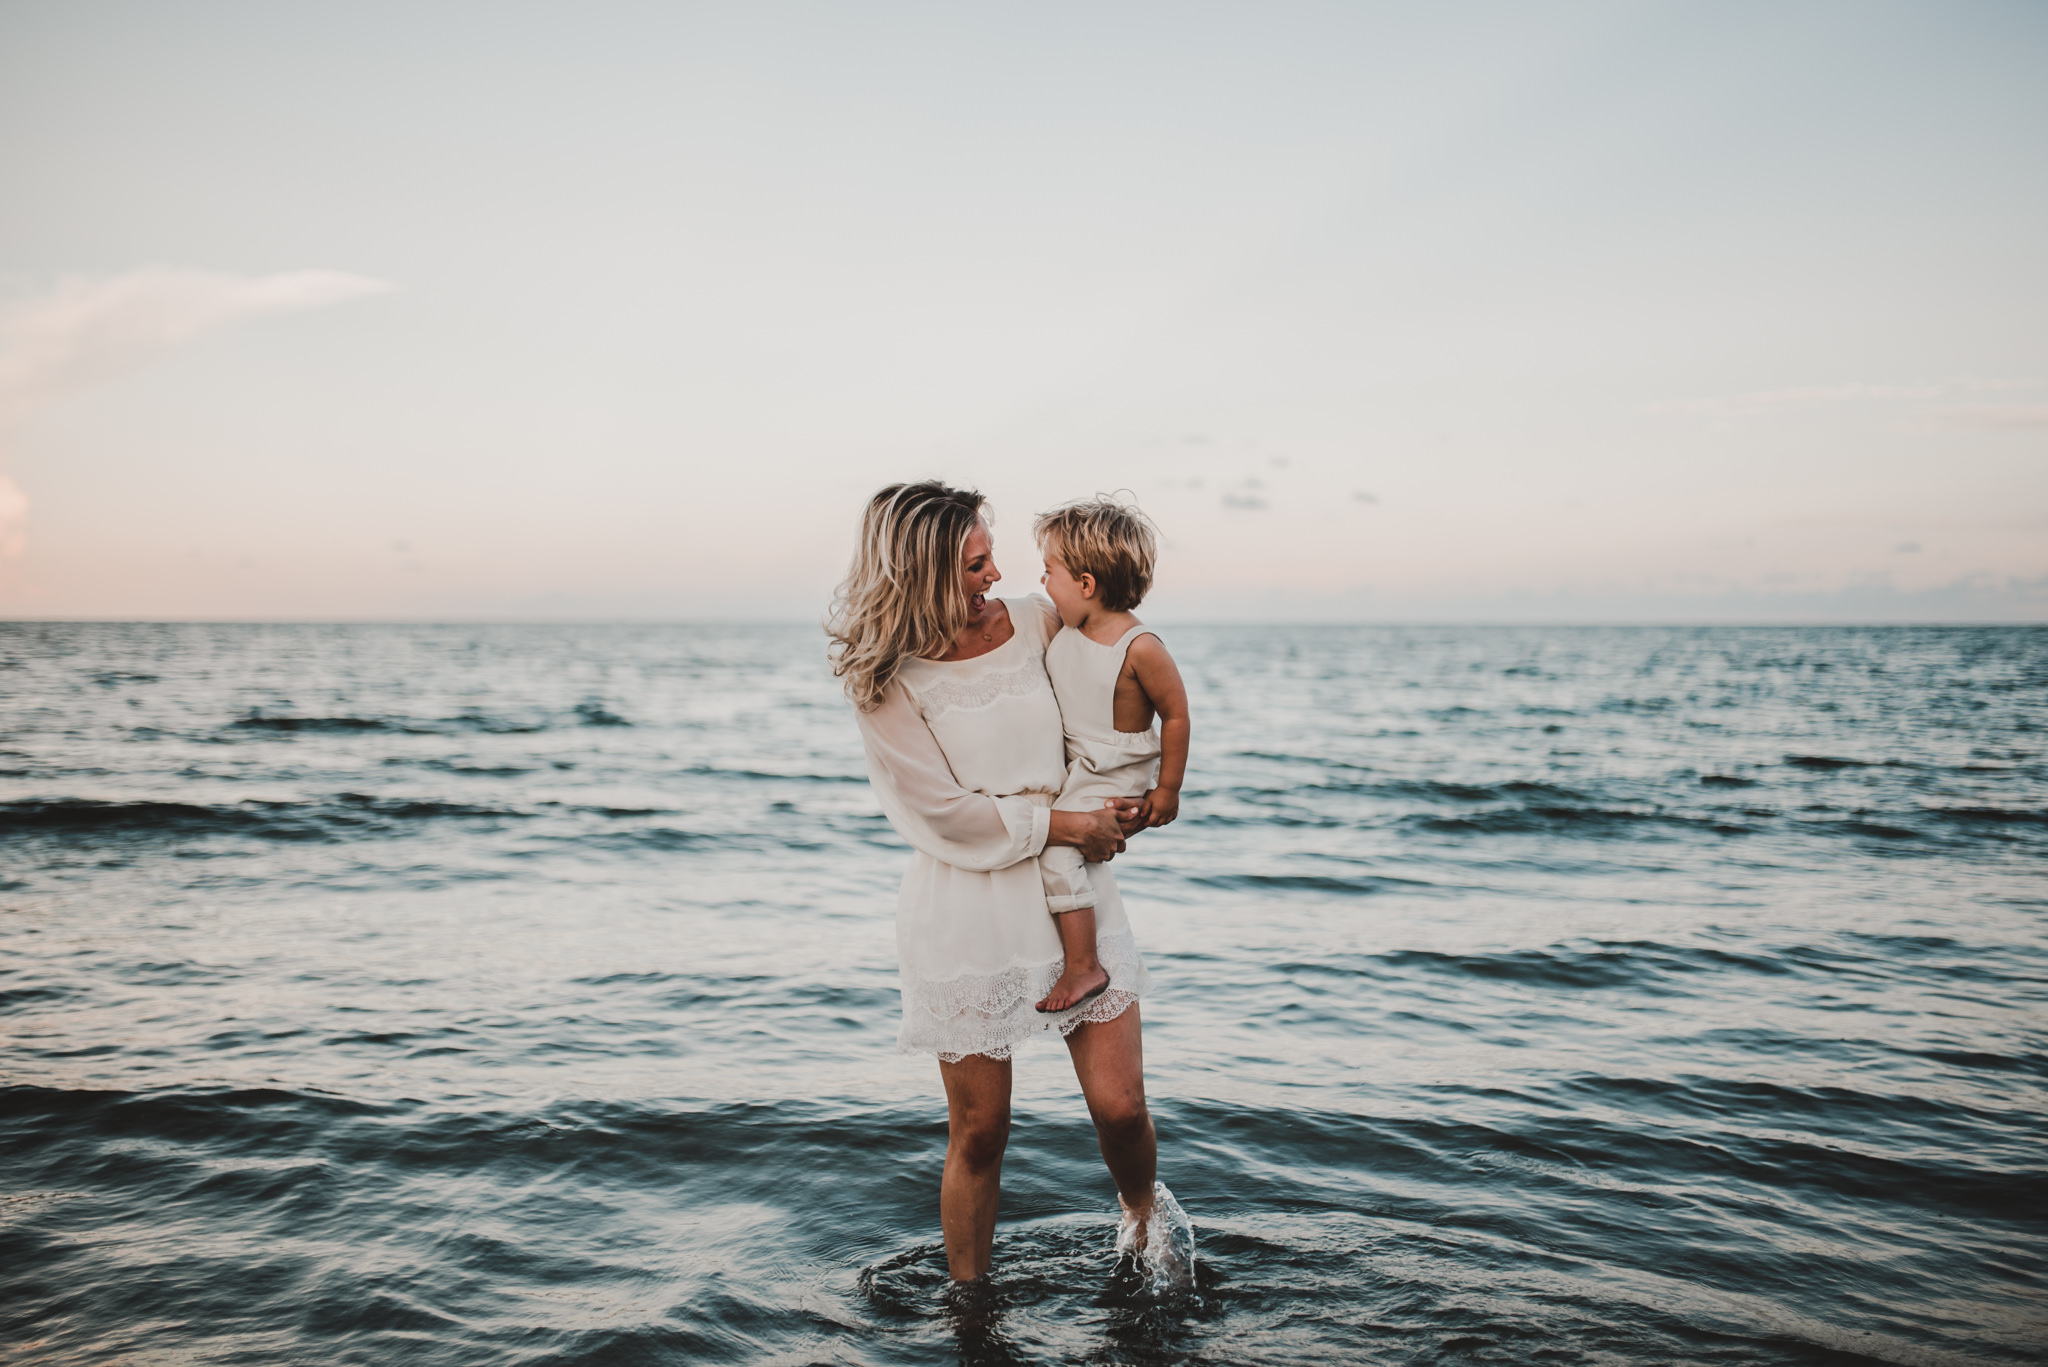 twyla jones photography - treasure coast florida - mother son at the beach--13.jpg